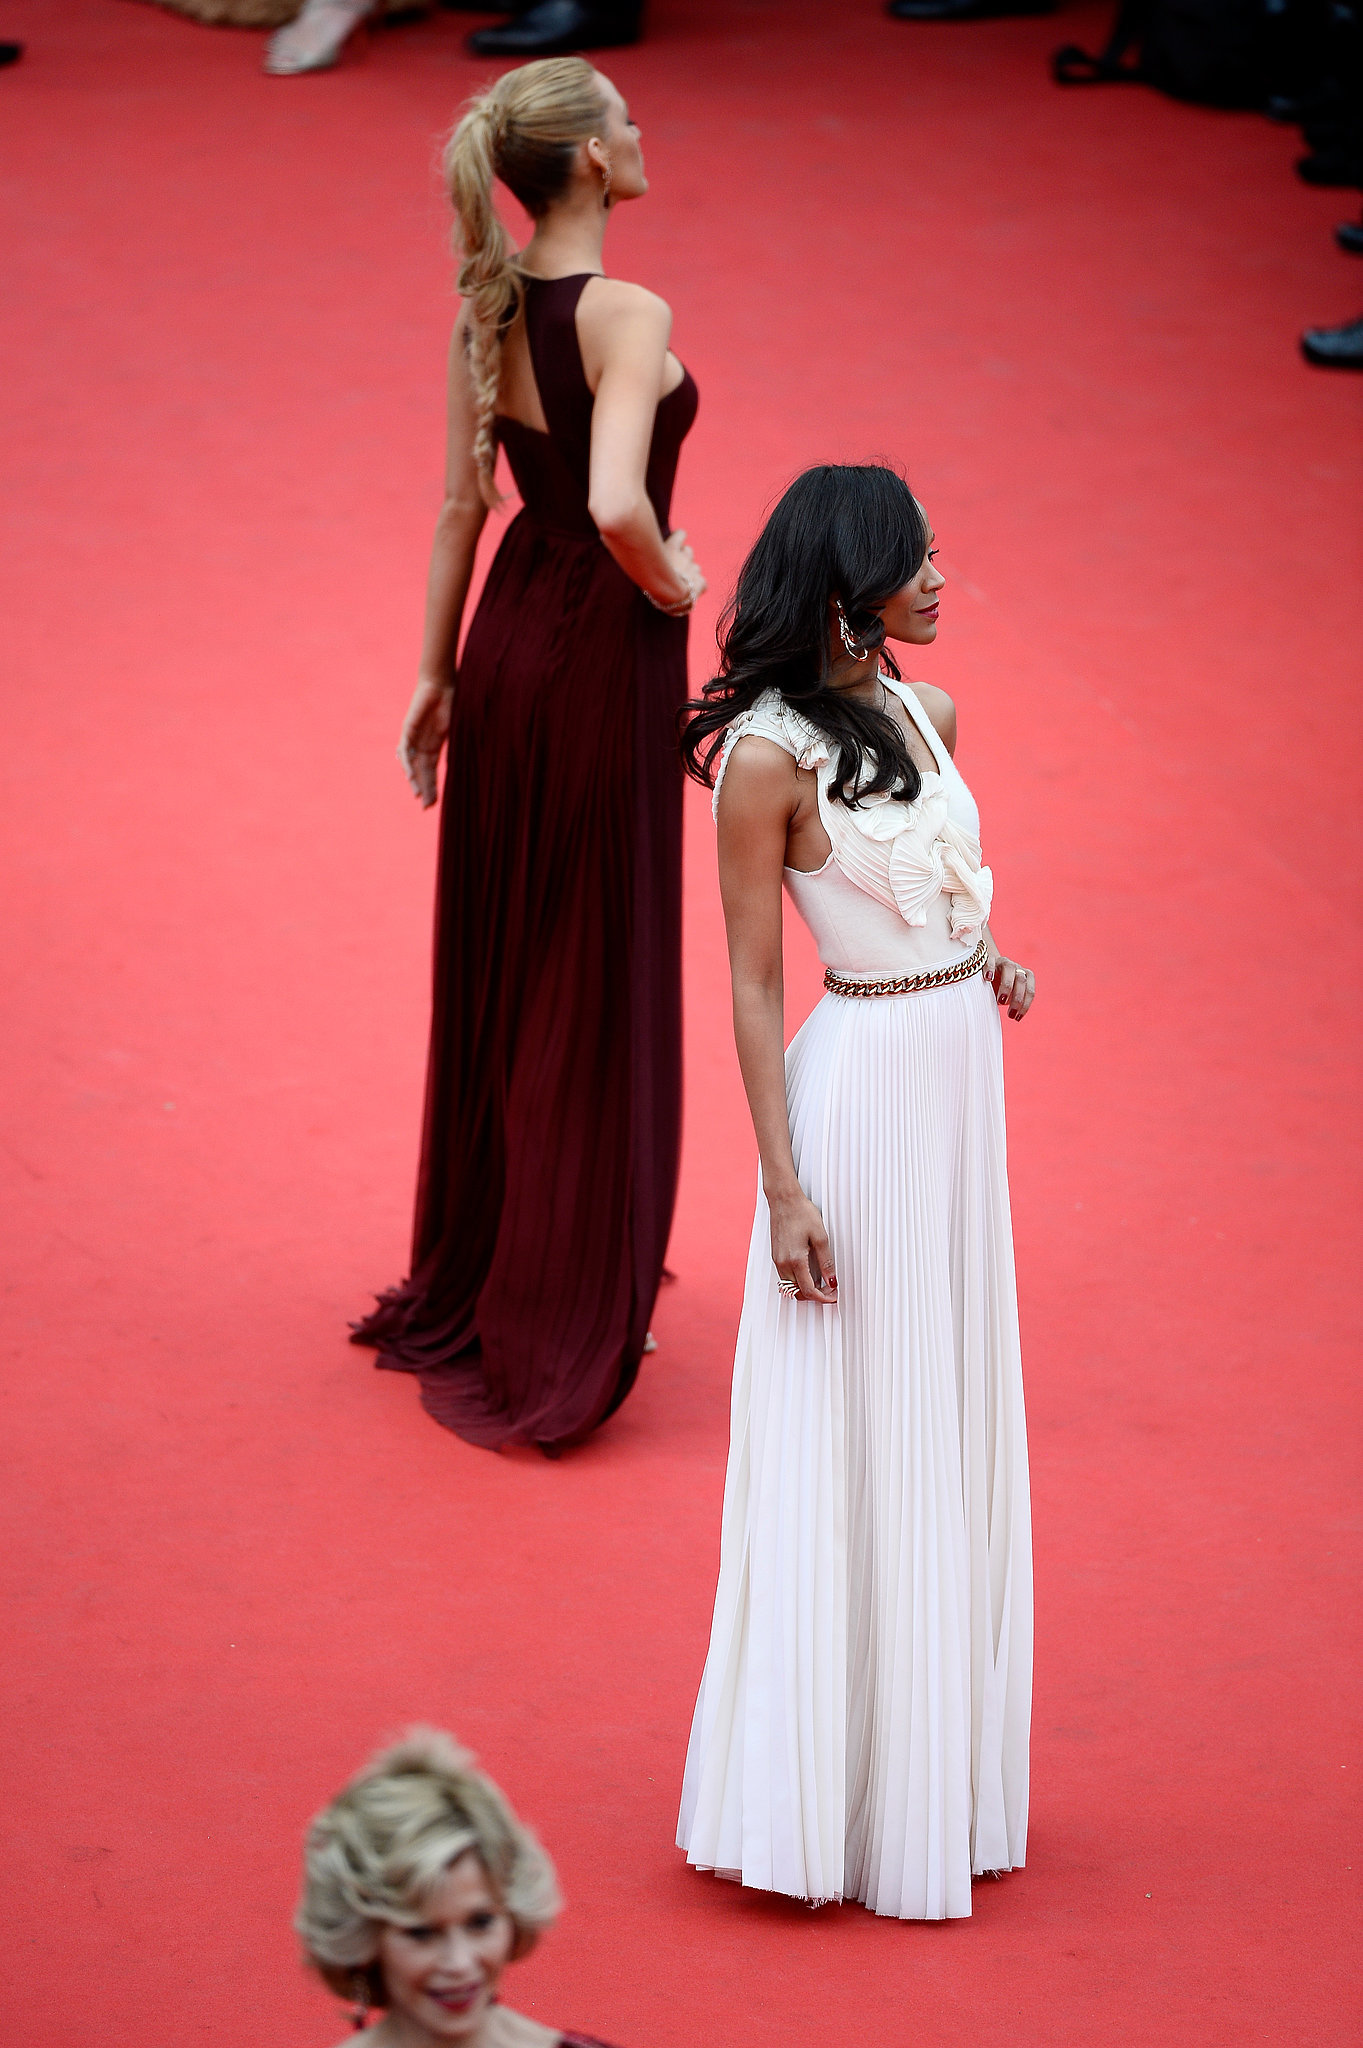 Blake Lively and Zoe Saldana at the Grace of Monaco Premiere